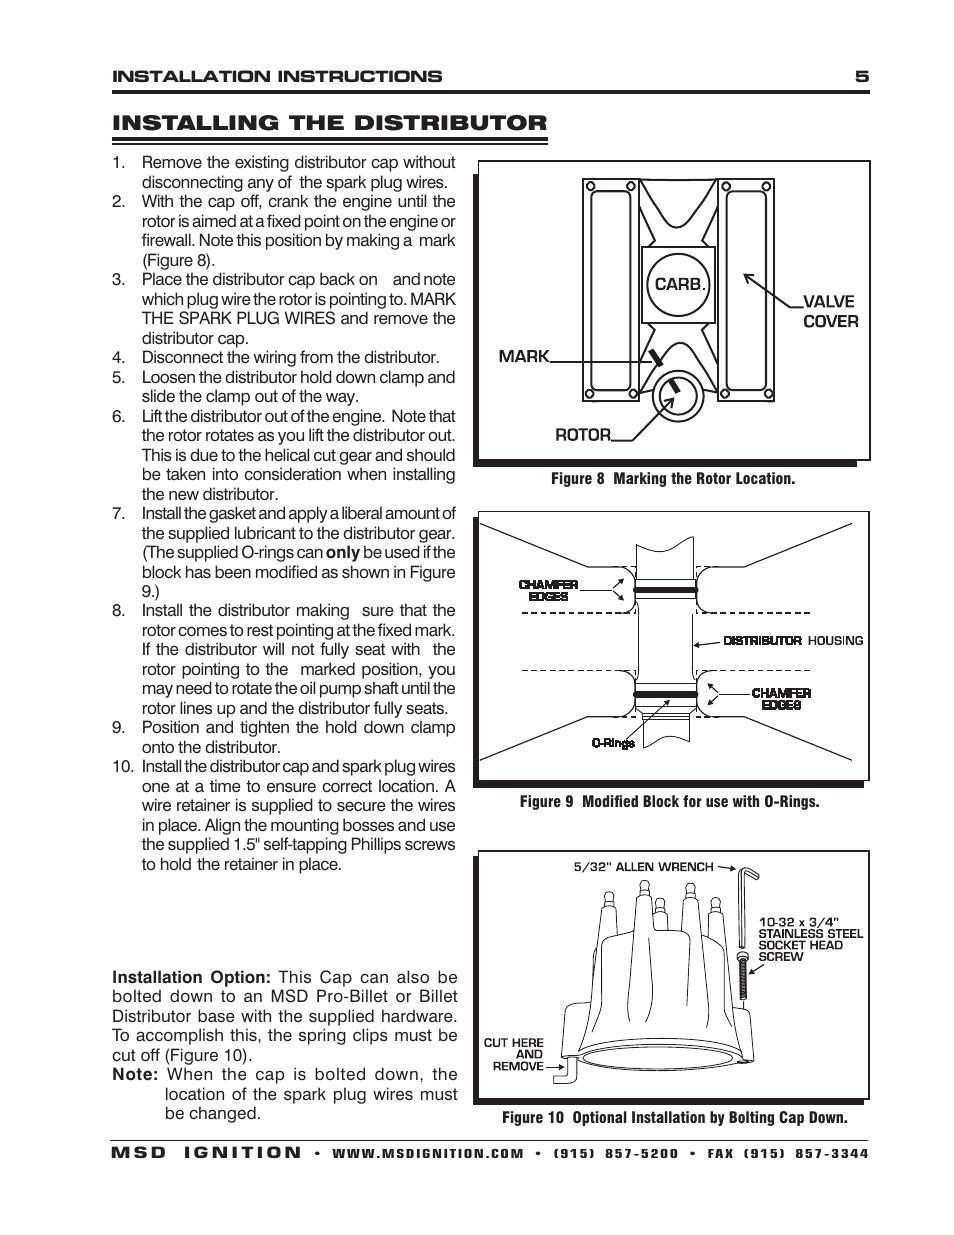 Msd 8361 Wiring Diagram - Trusted Wiring Diagram